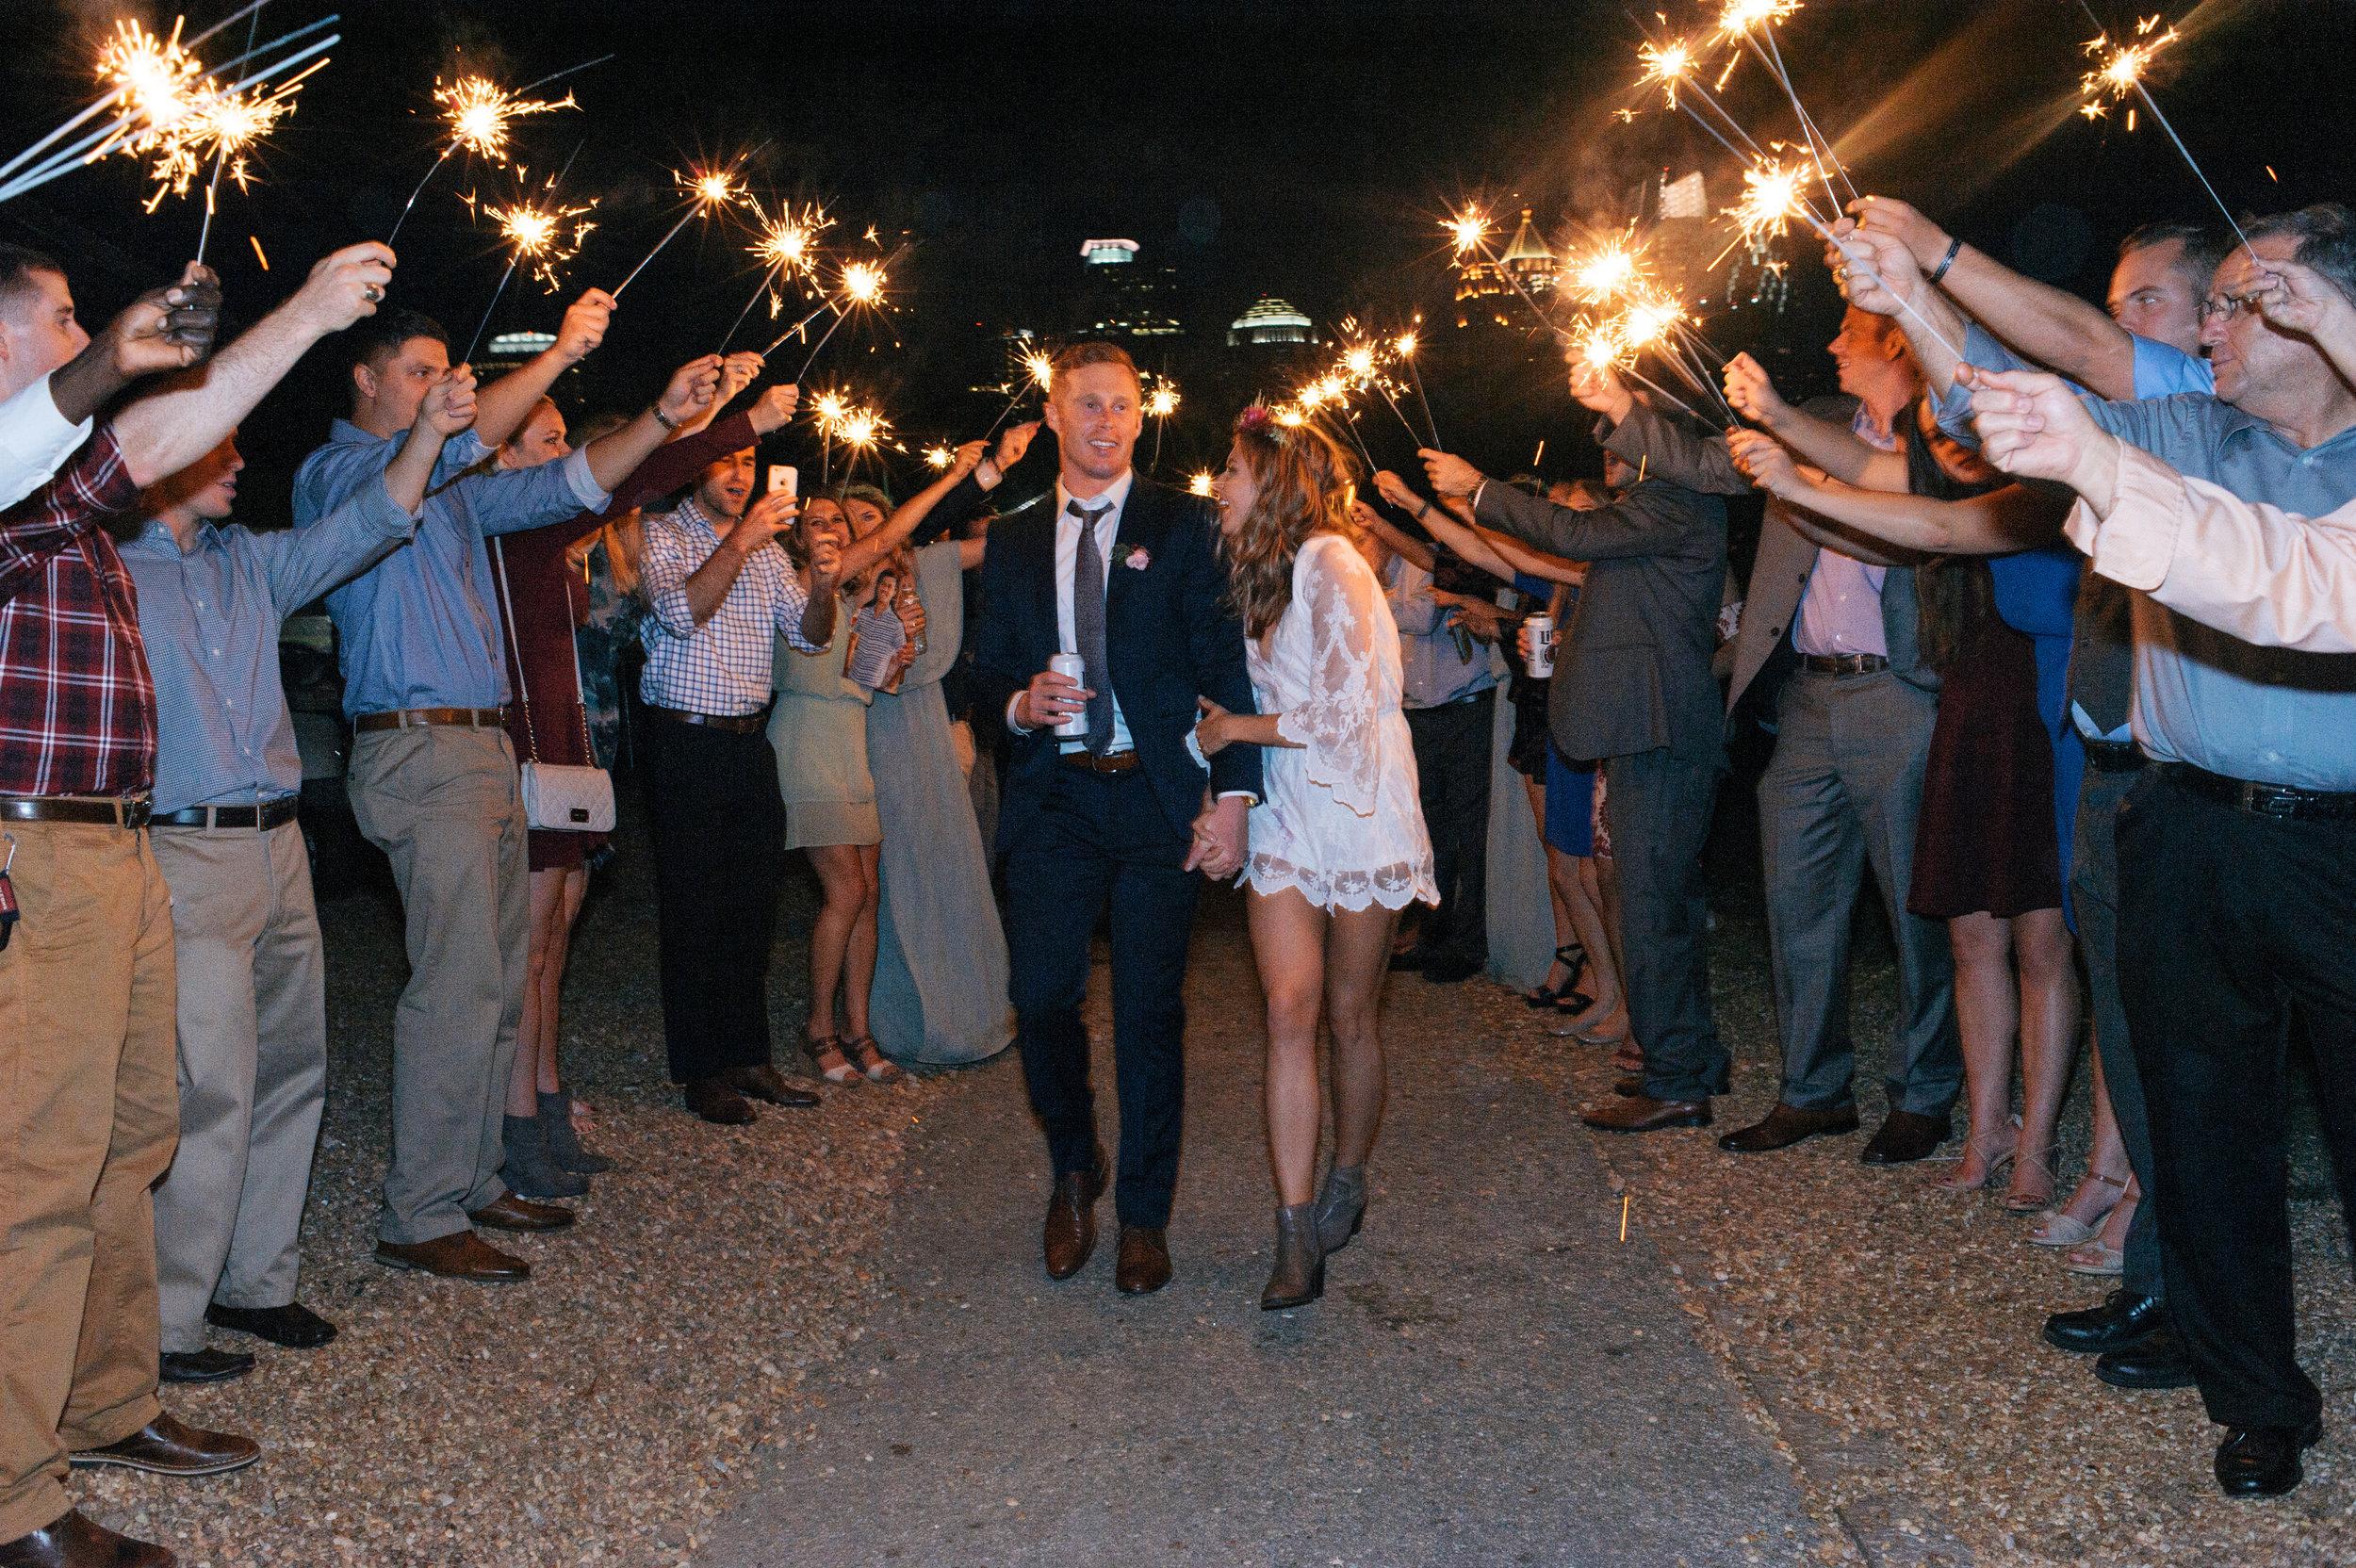 kristin-and-peter-atlanta-georgia-wedding-october-8th-2016 (1053 of 1068).jpg